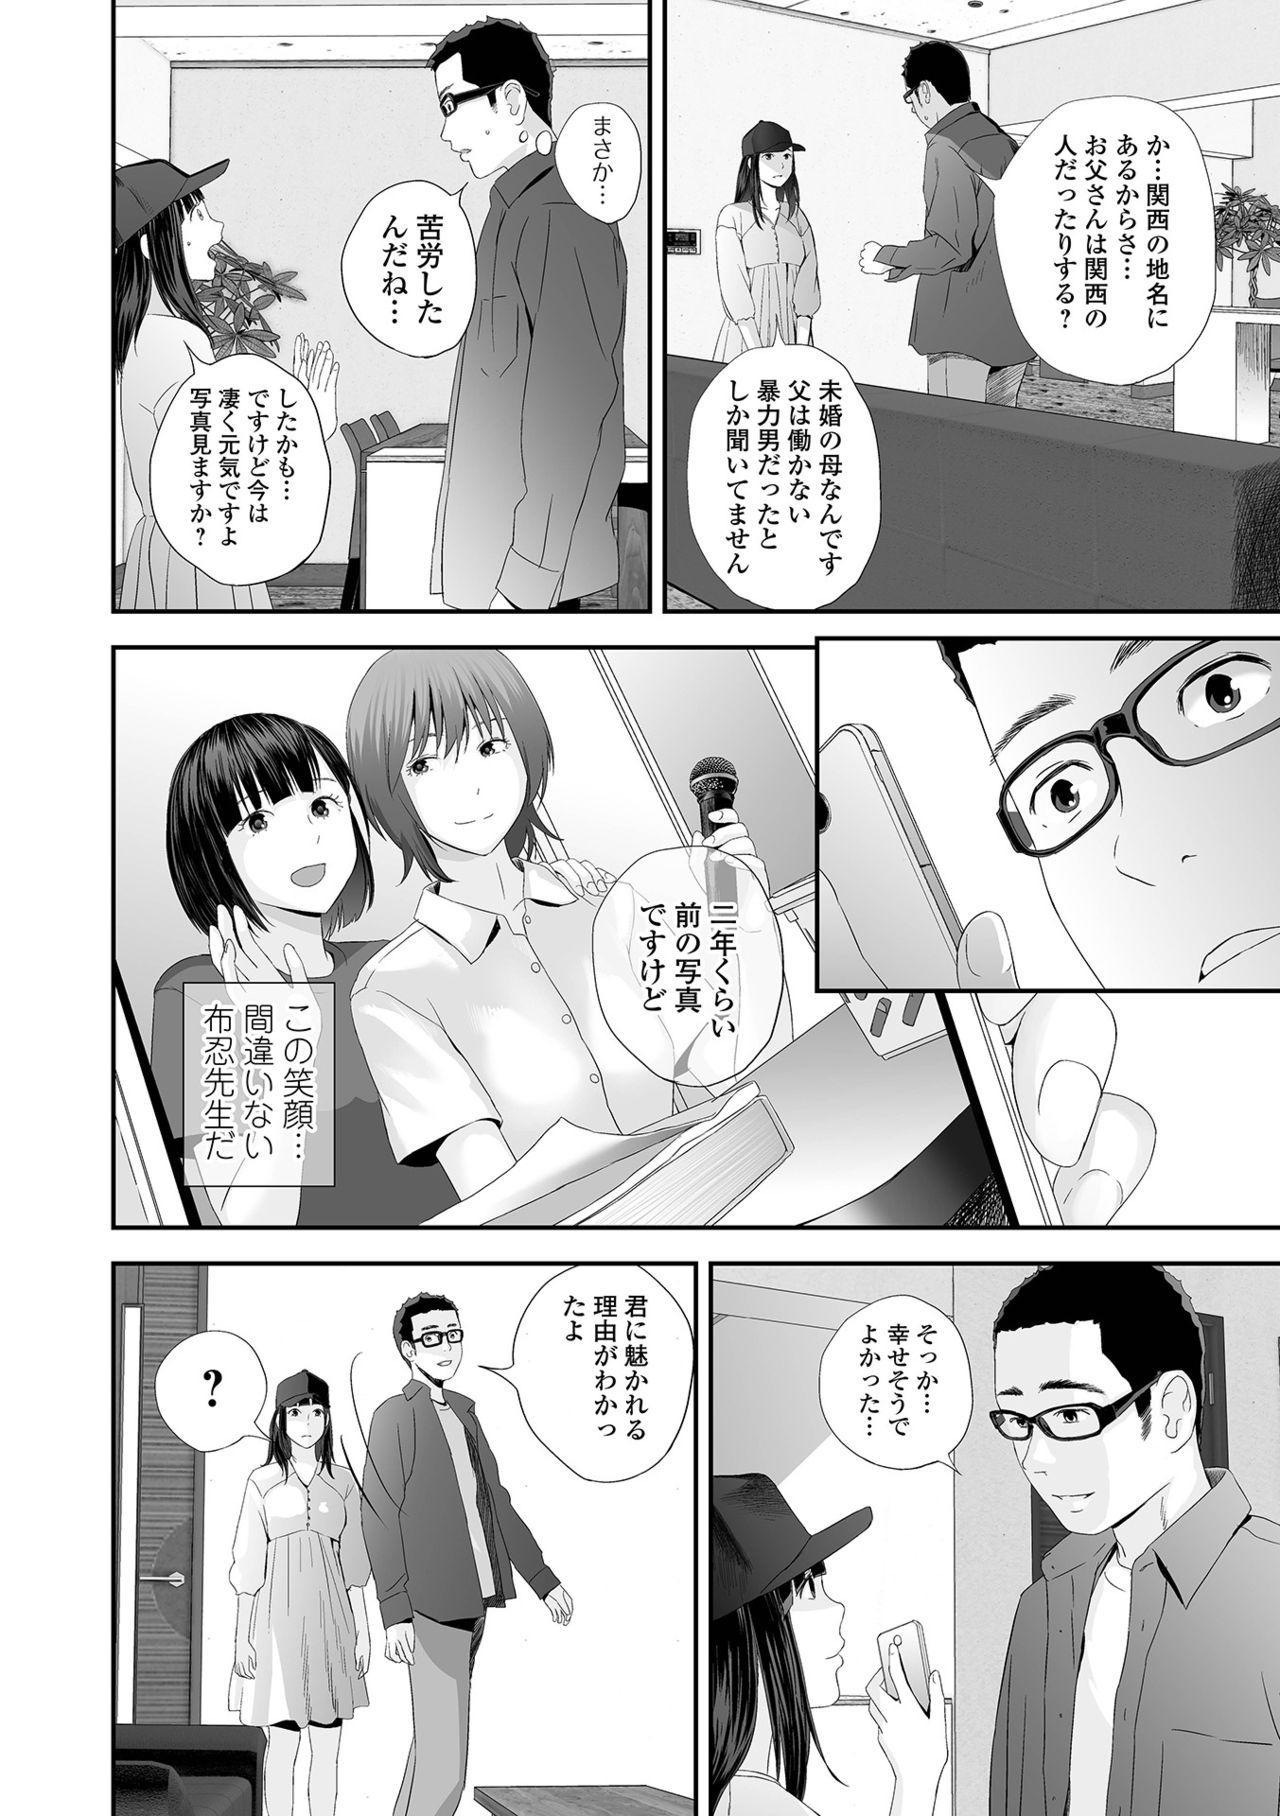 COMIC Shigekiteki SQUIRT!! Vol. 25 49